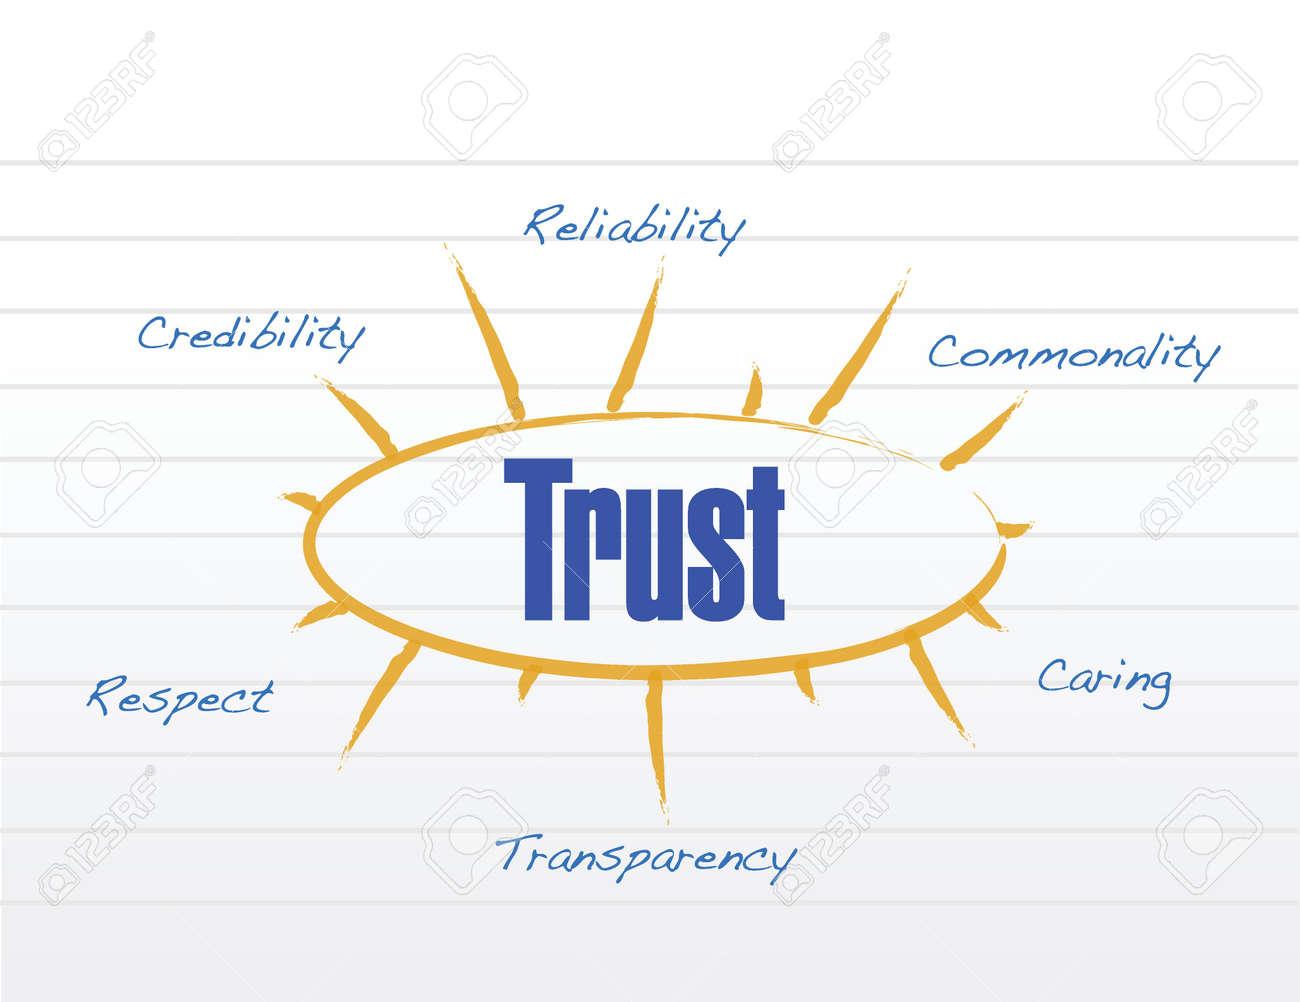 A b trust diagram new wiring diagram 2018 trust model diagram business graph chart illustration design ab trust flow chart q tip estate planning diagrams a b trusts disadvantages on a b trust nvjuhfo Choice Image